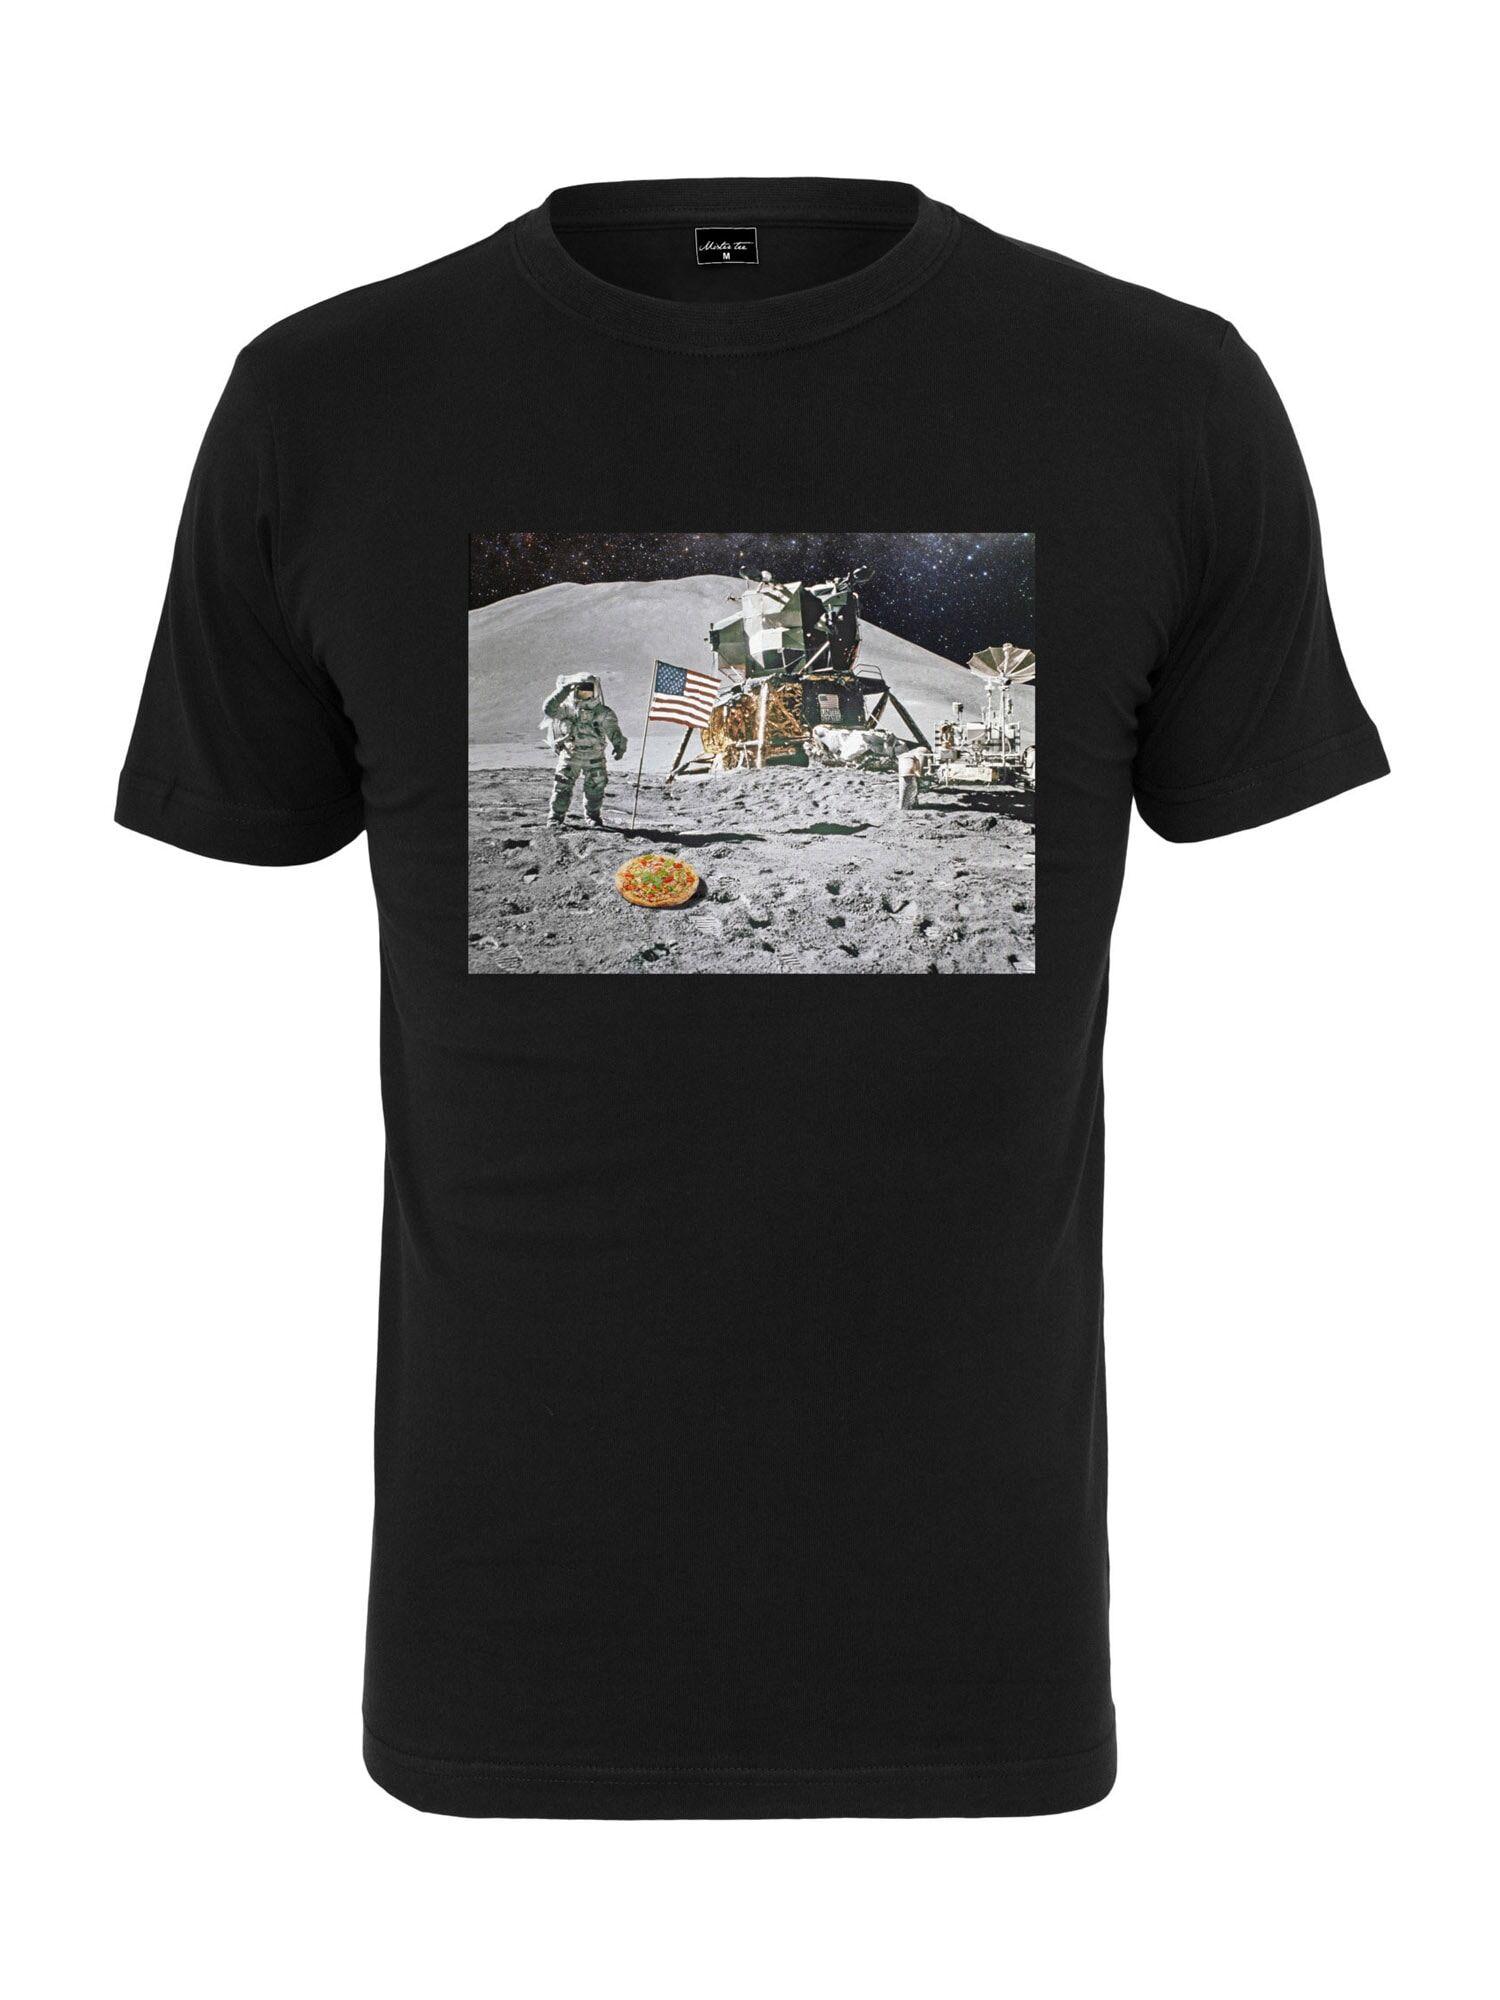 Tee T-Shirt 'Pizza Moon Landing'  - Noir - Taille: L - male